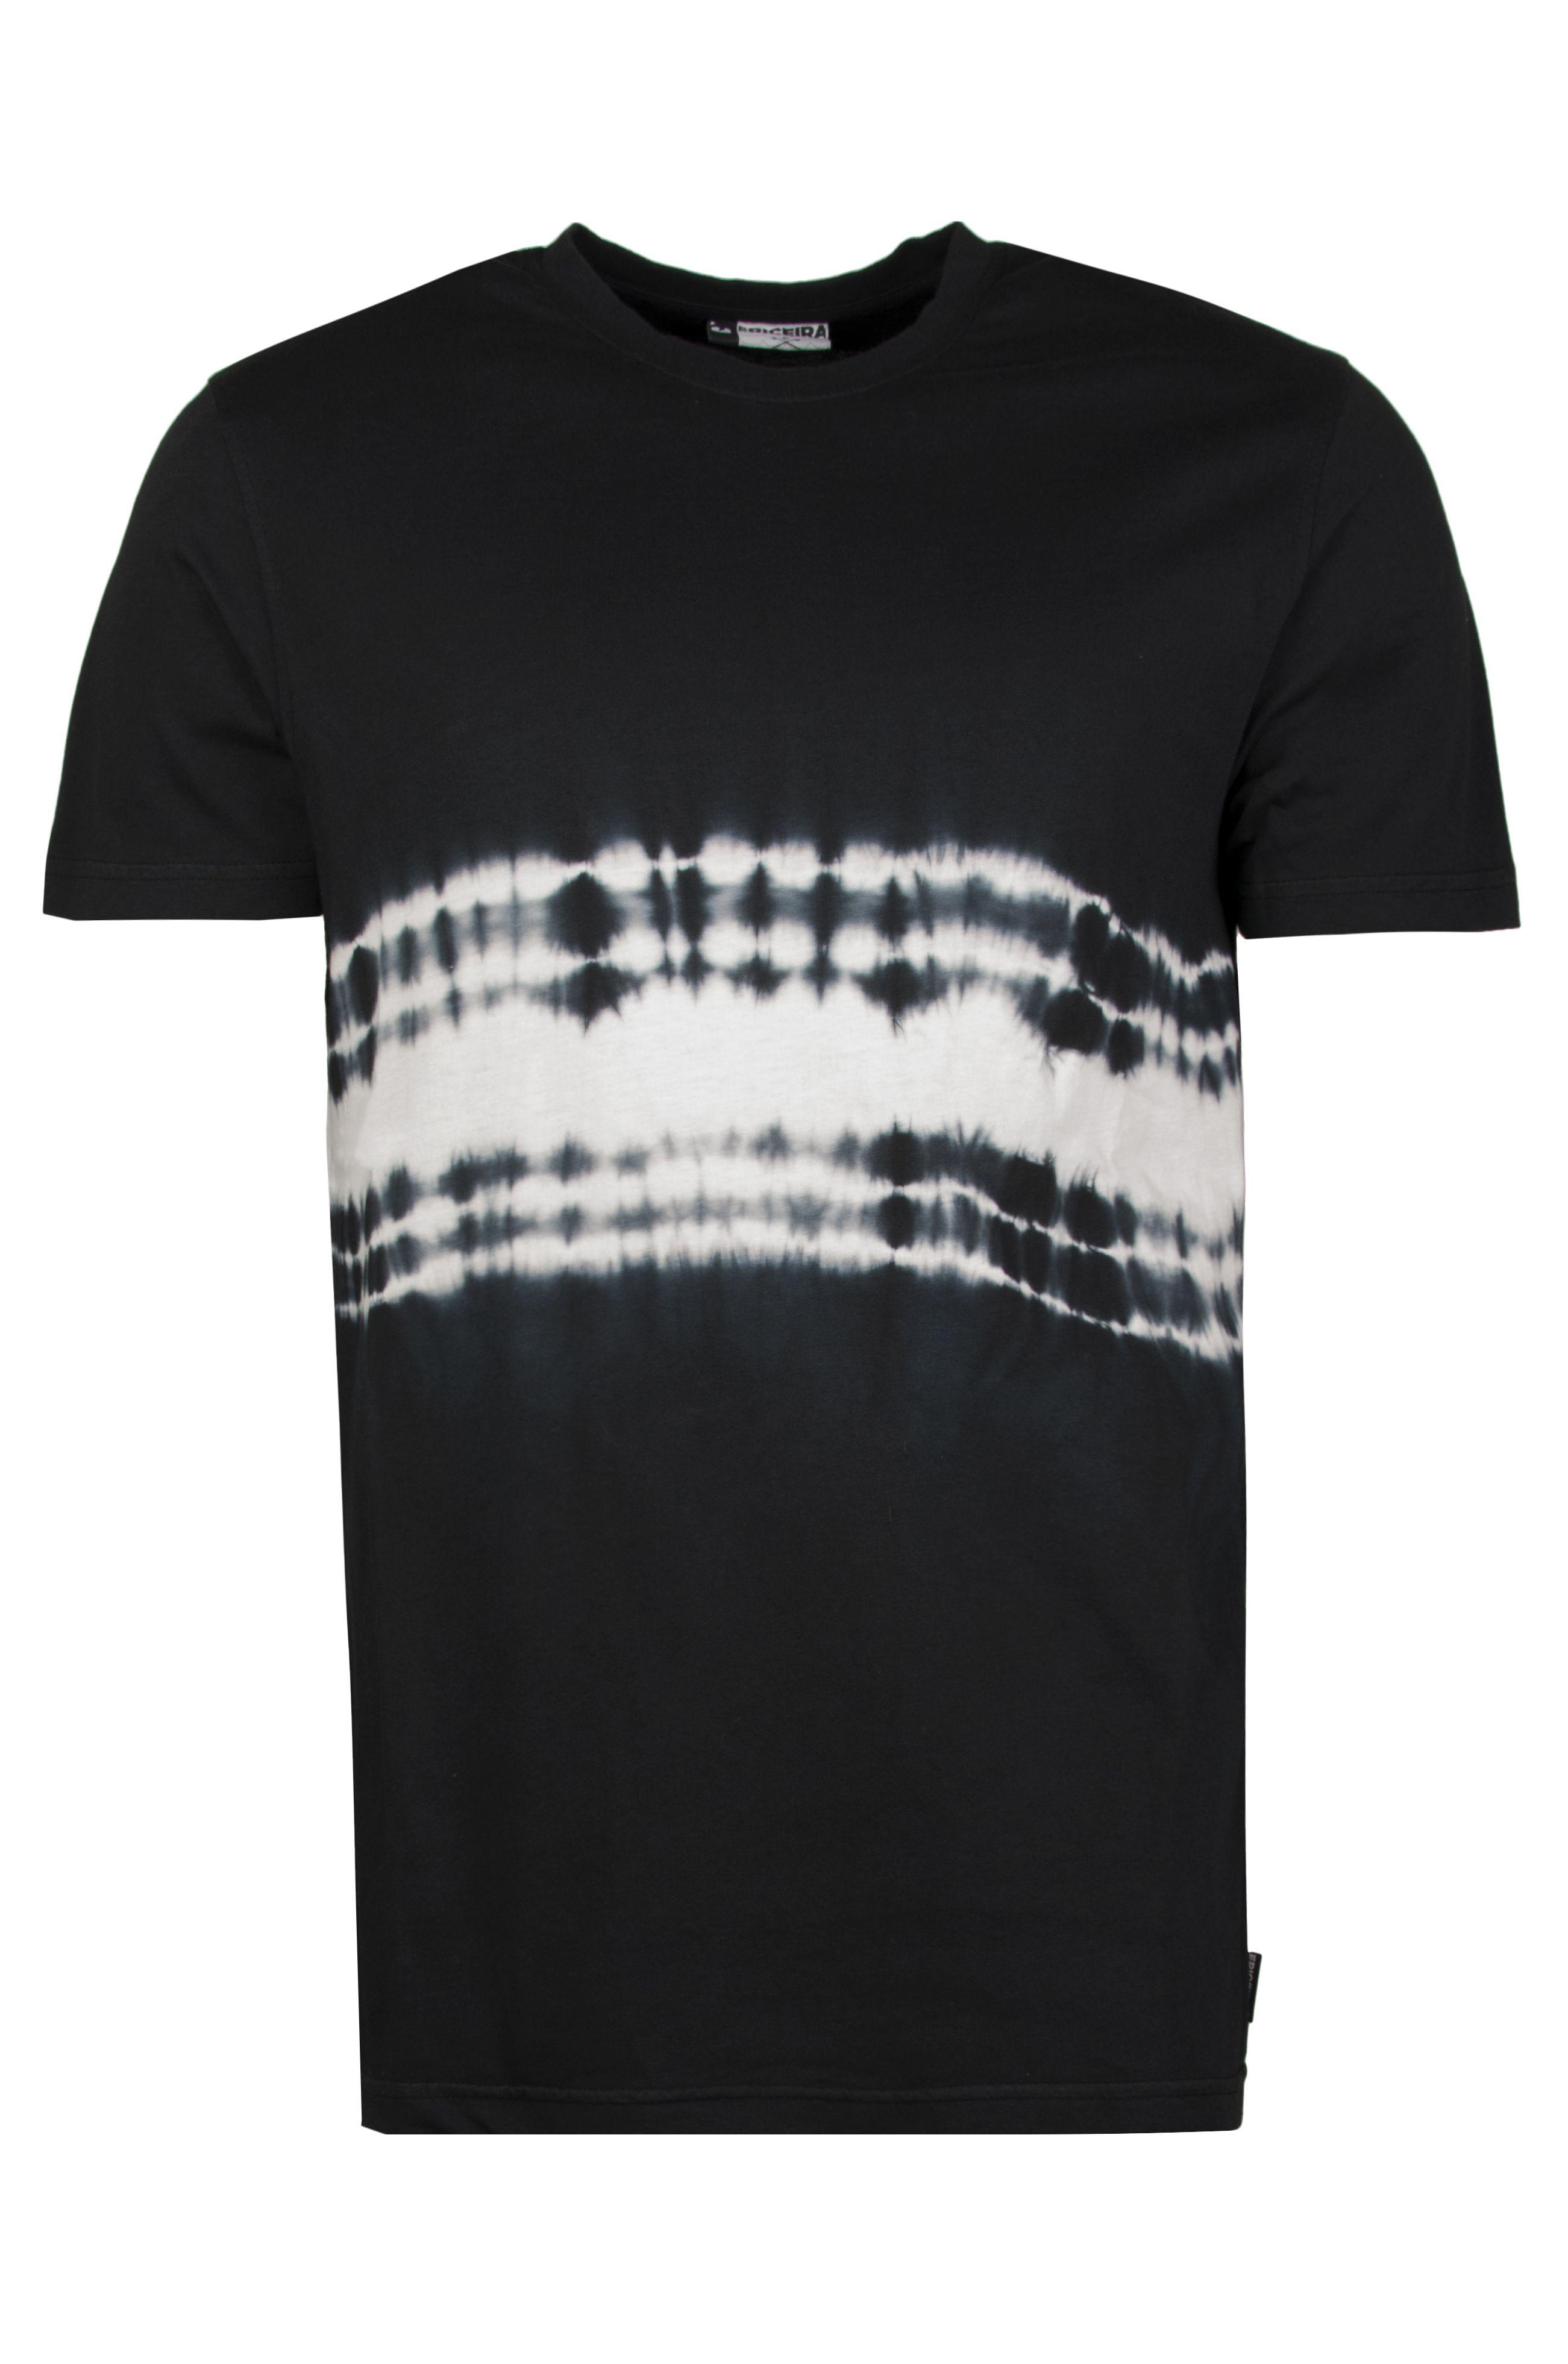 T-Shirt Ericeira Surf Skate SOUL STRIPE Dark Charcoal